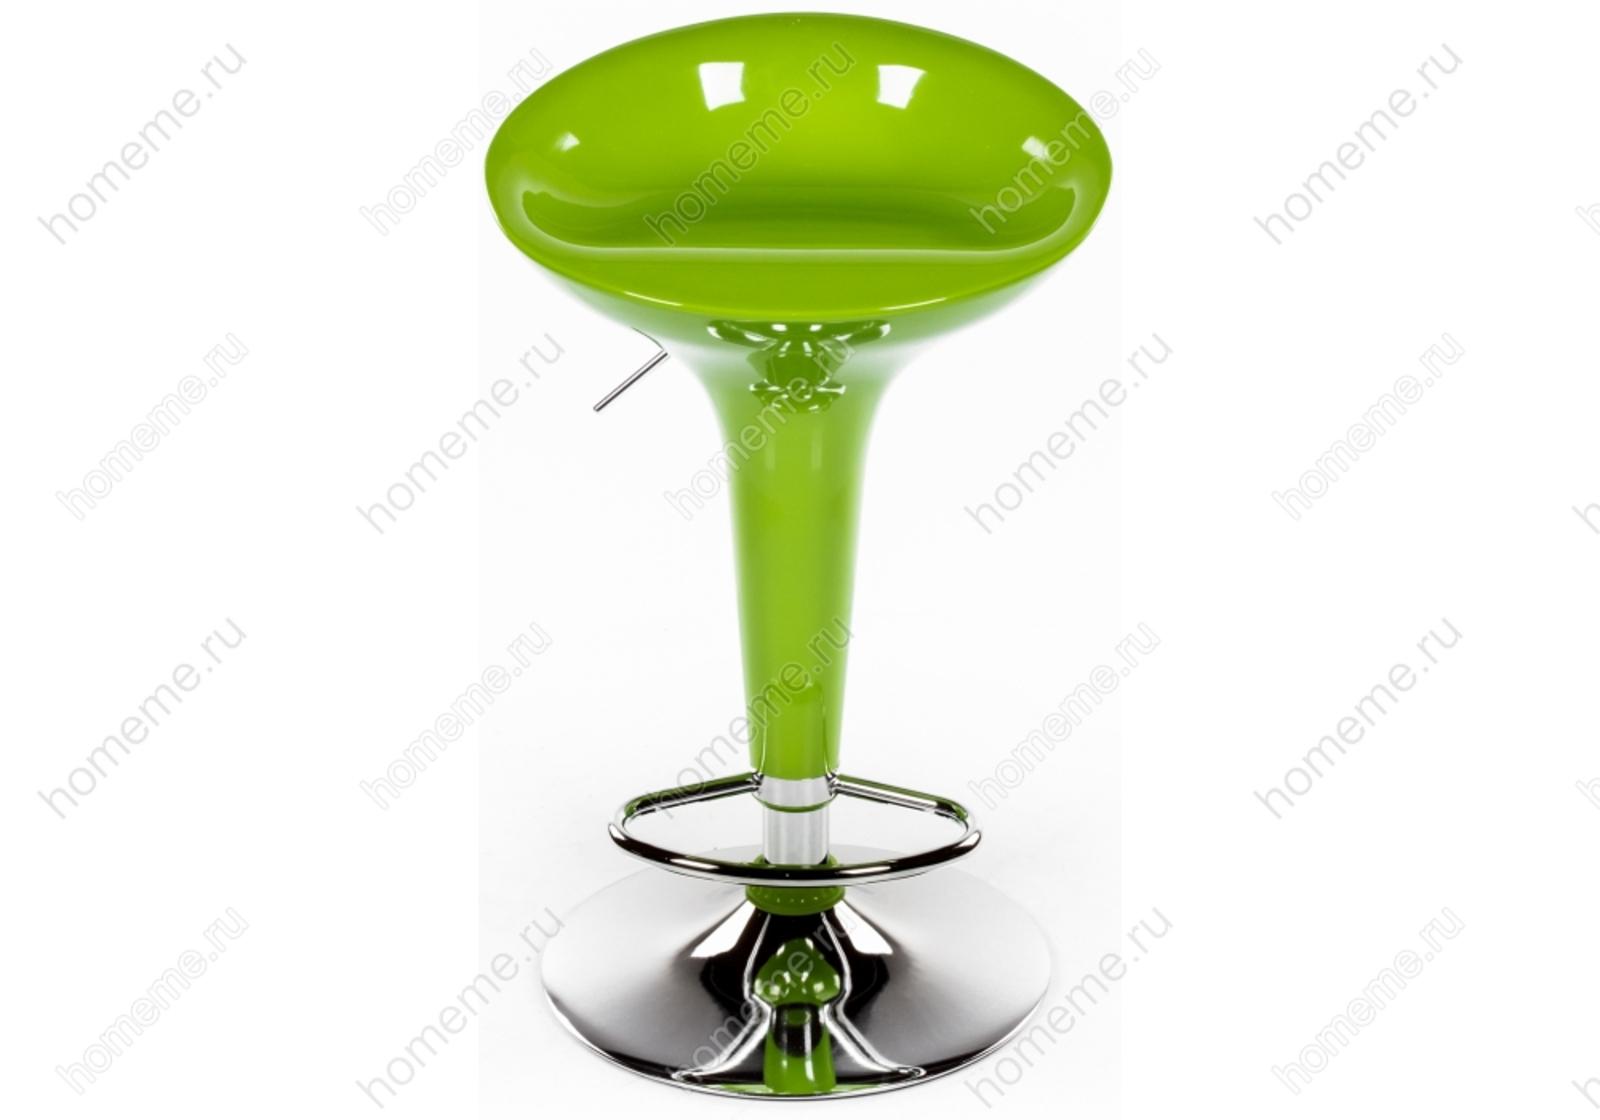 Барный стул Orion зеленый (1250)